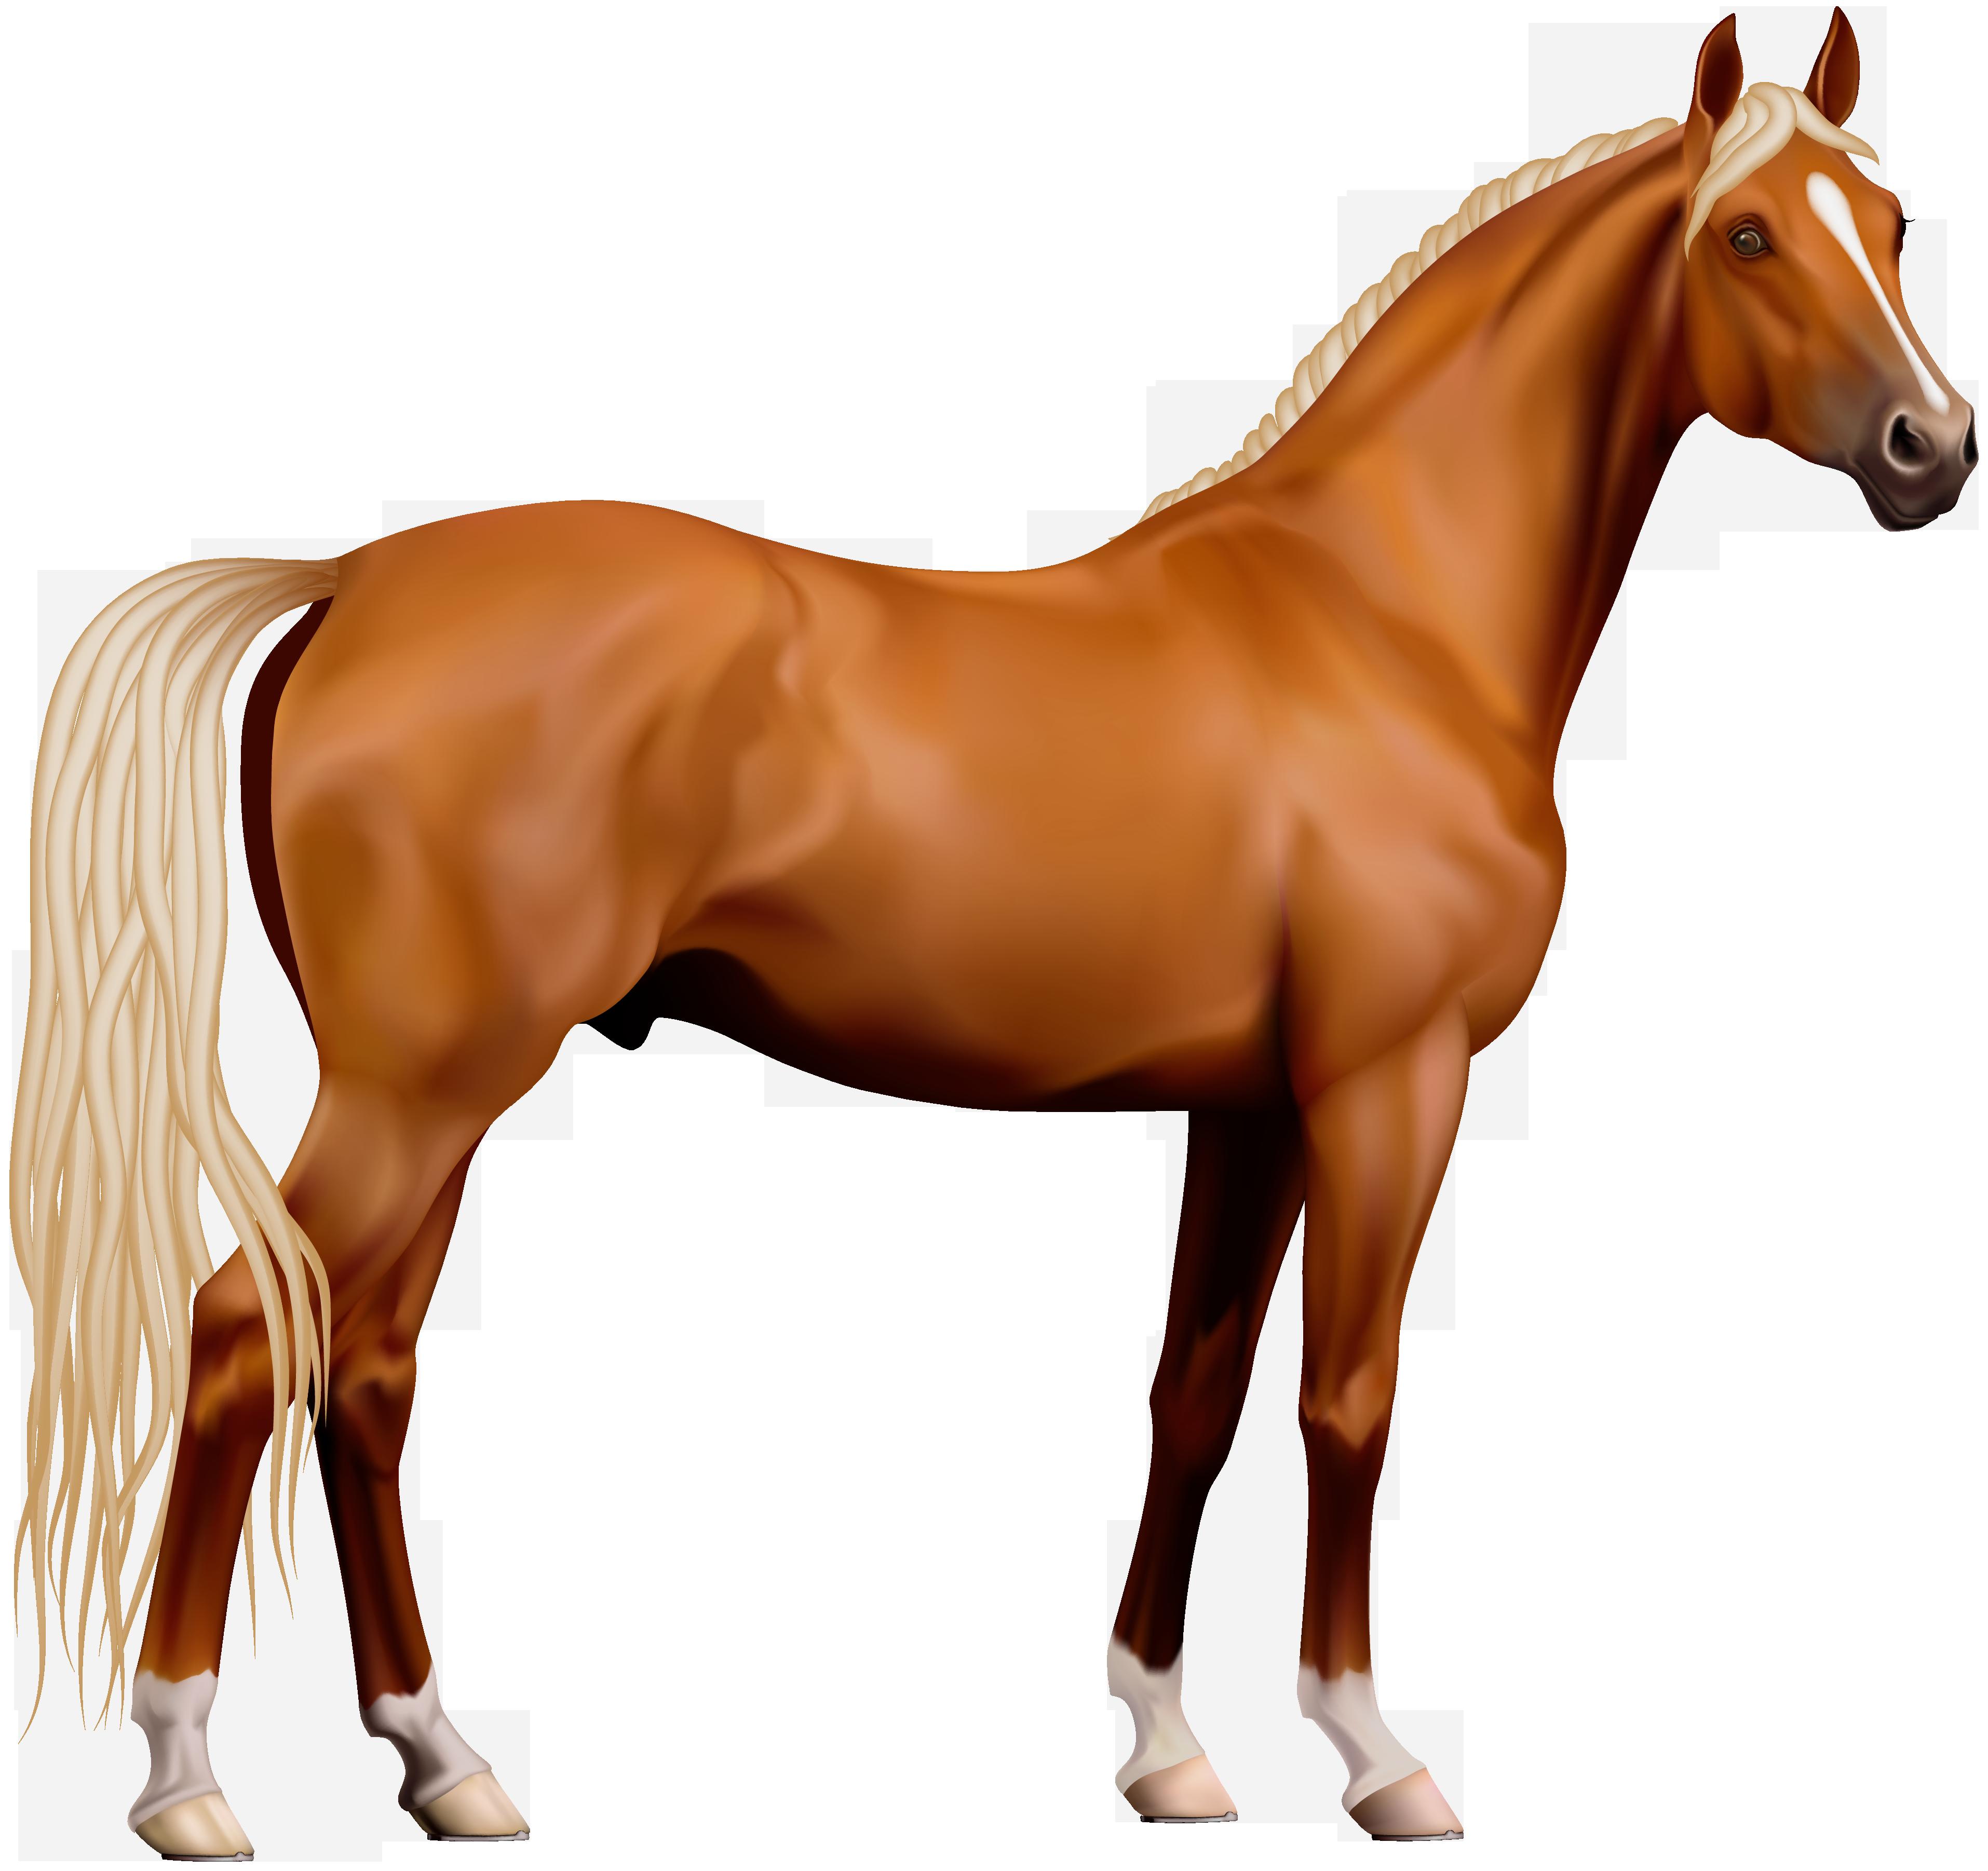 Transparent Horse PNG Clipart - Horse PNG